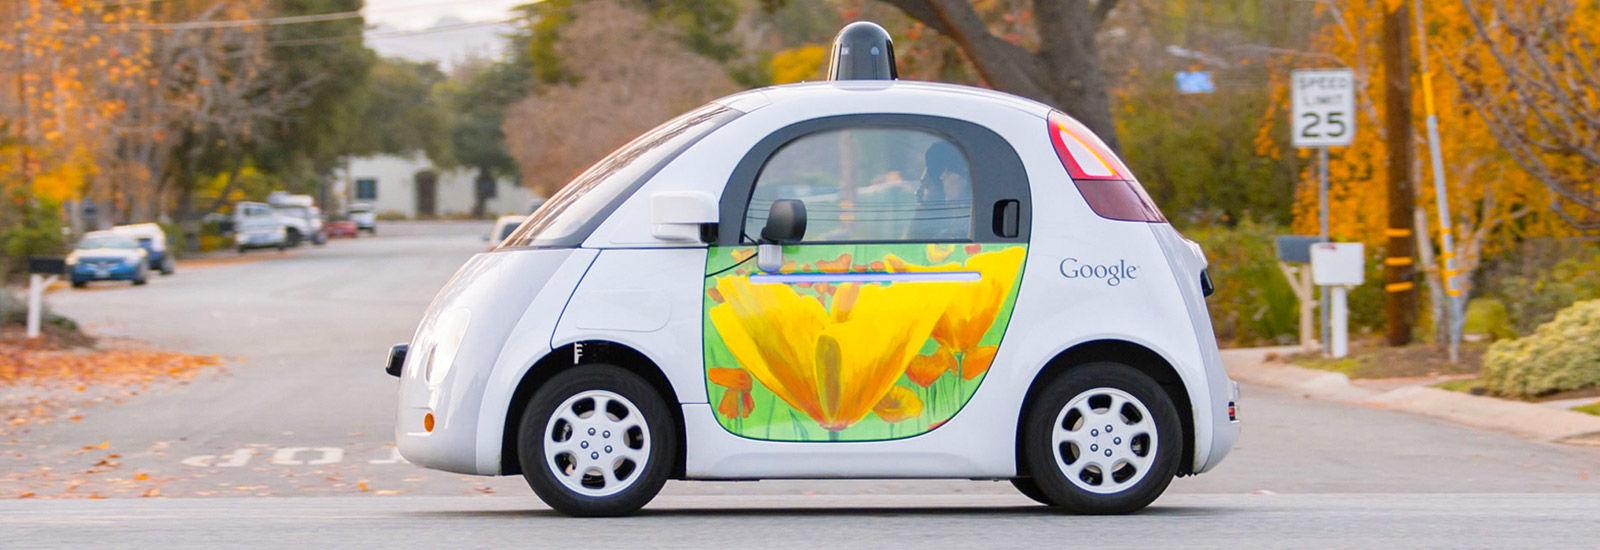 google-self-driving-car-side-4